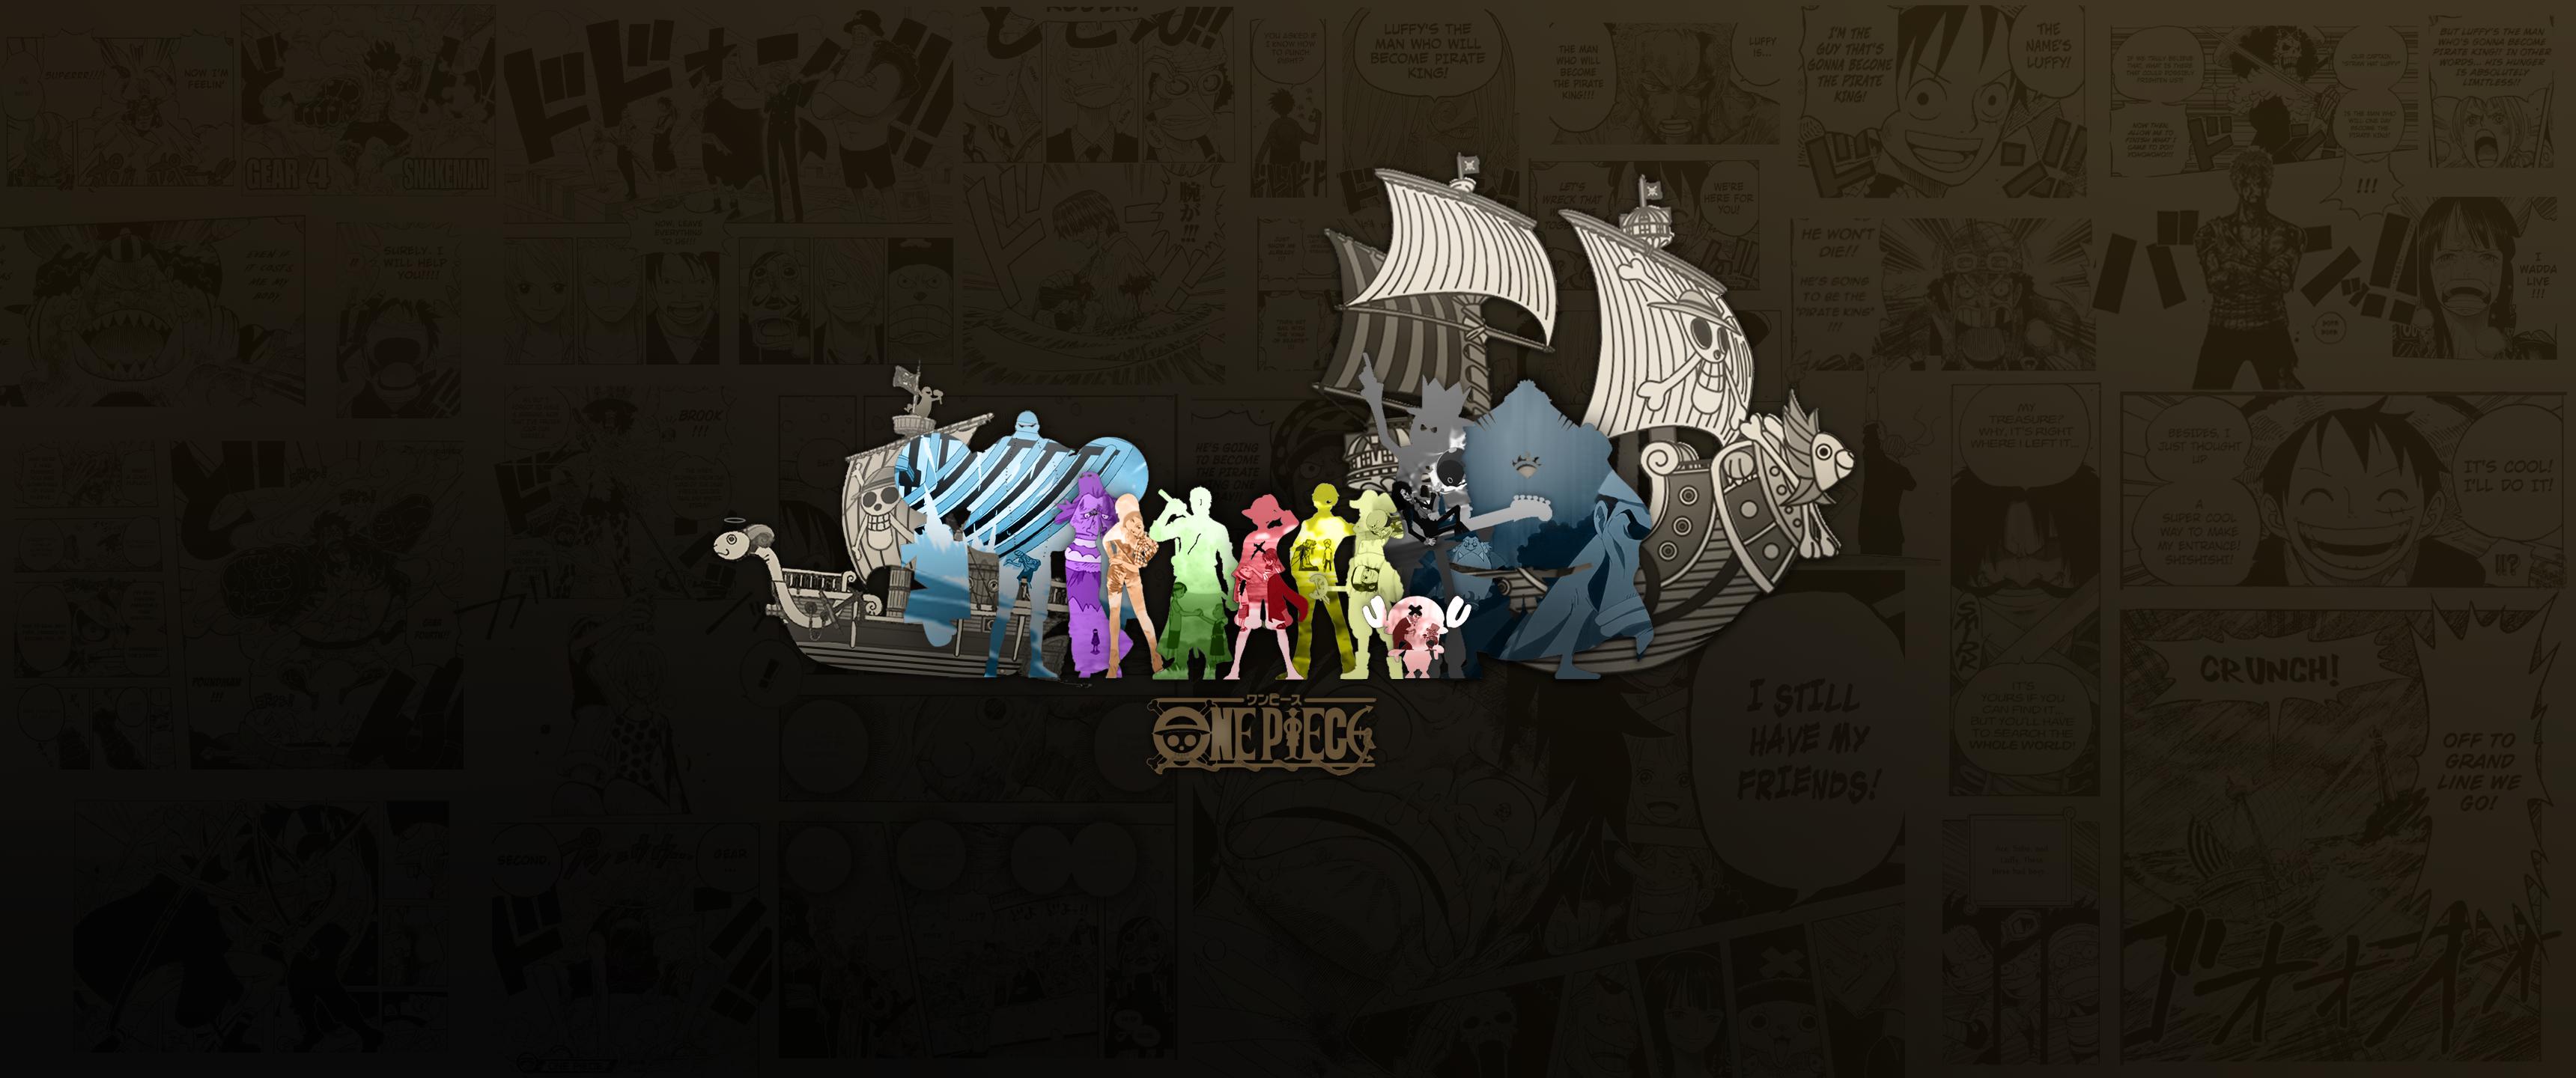 One Piece Ultrawide Wallpaper by